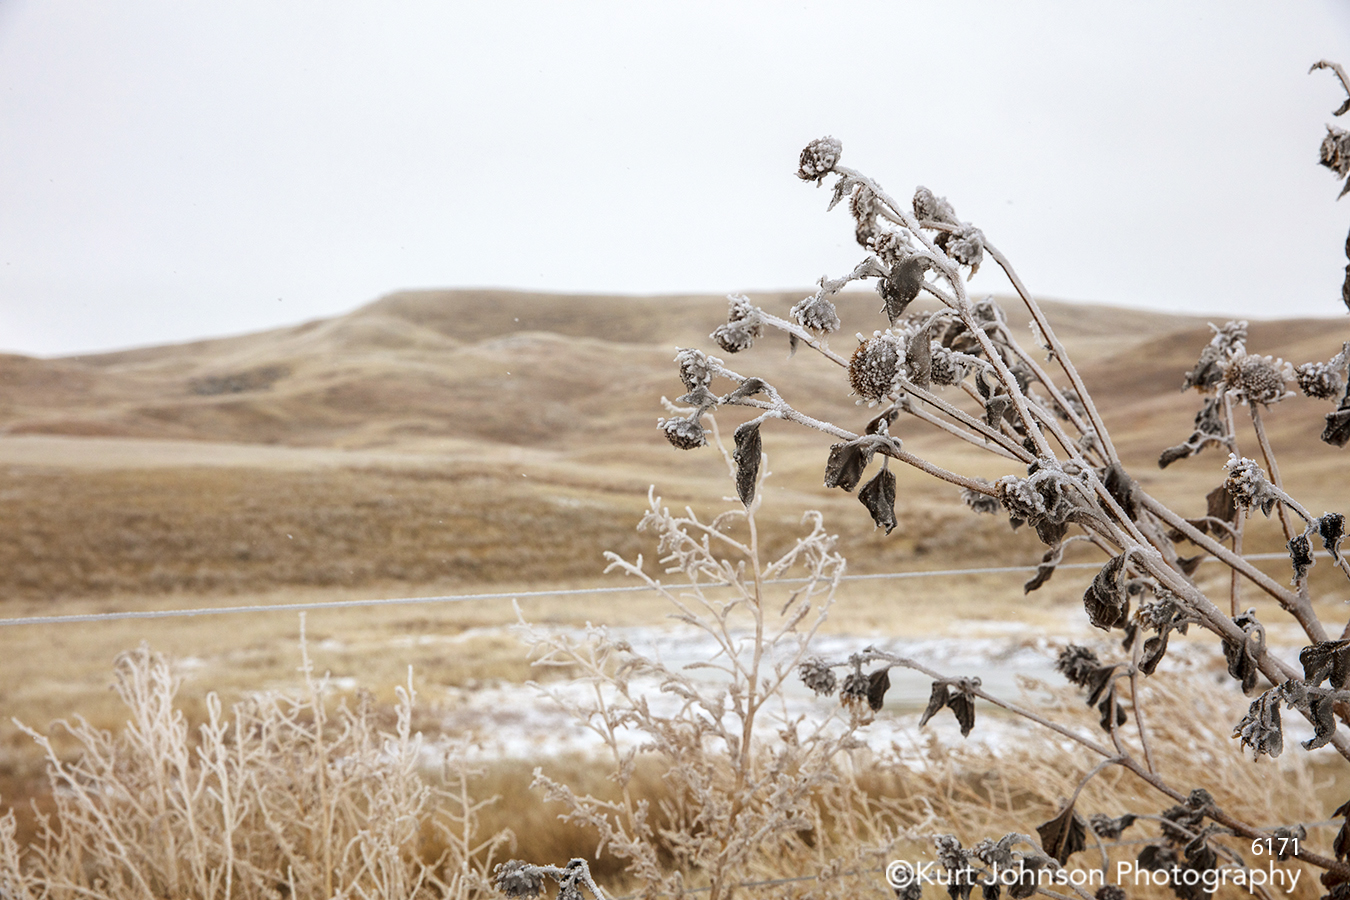 Badlands South Dakota Dakotas mountains landscape brown tan beige snow winter grass grasses